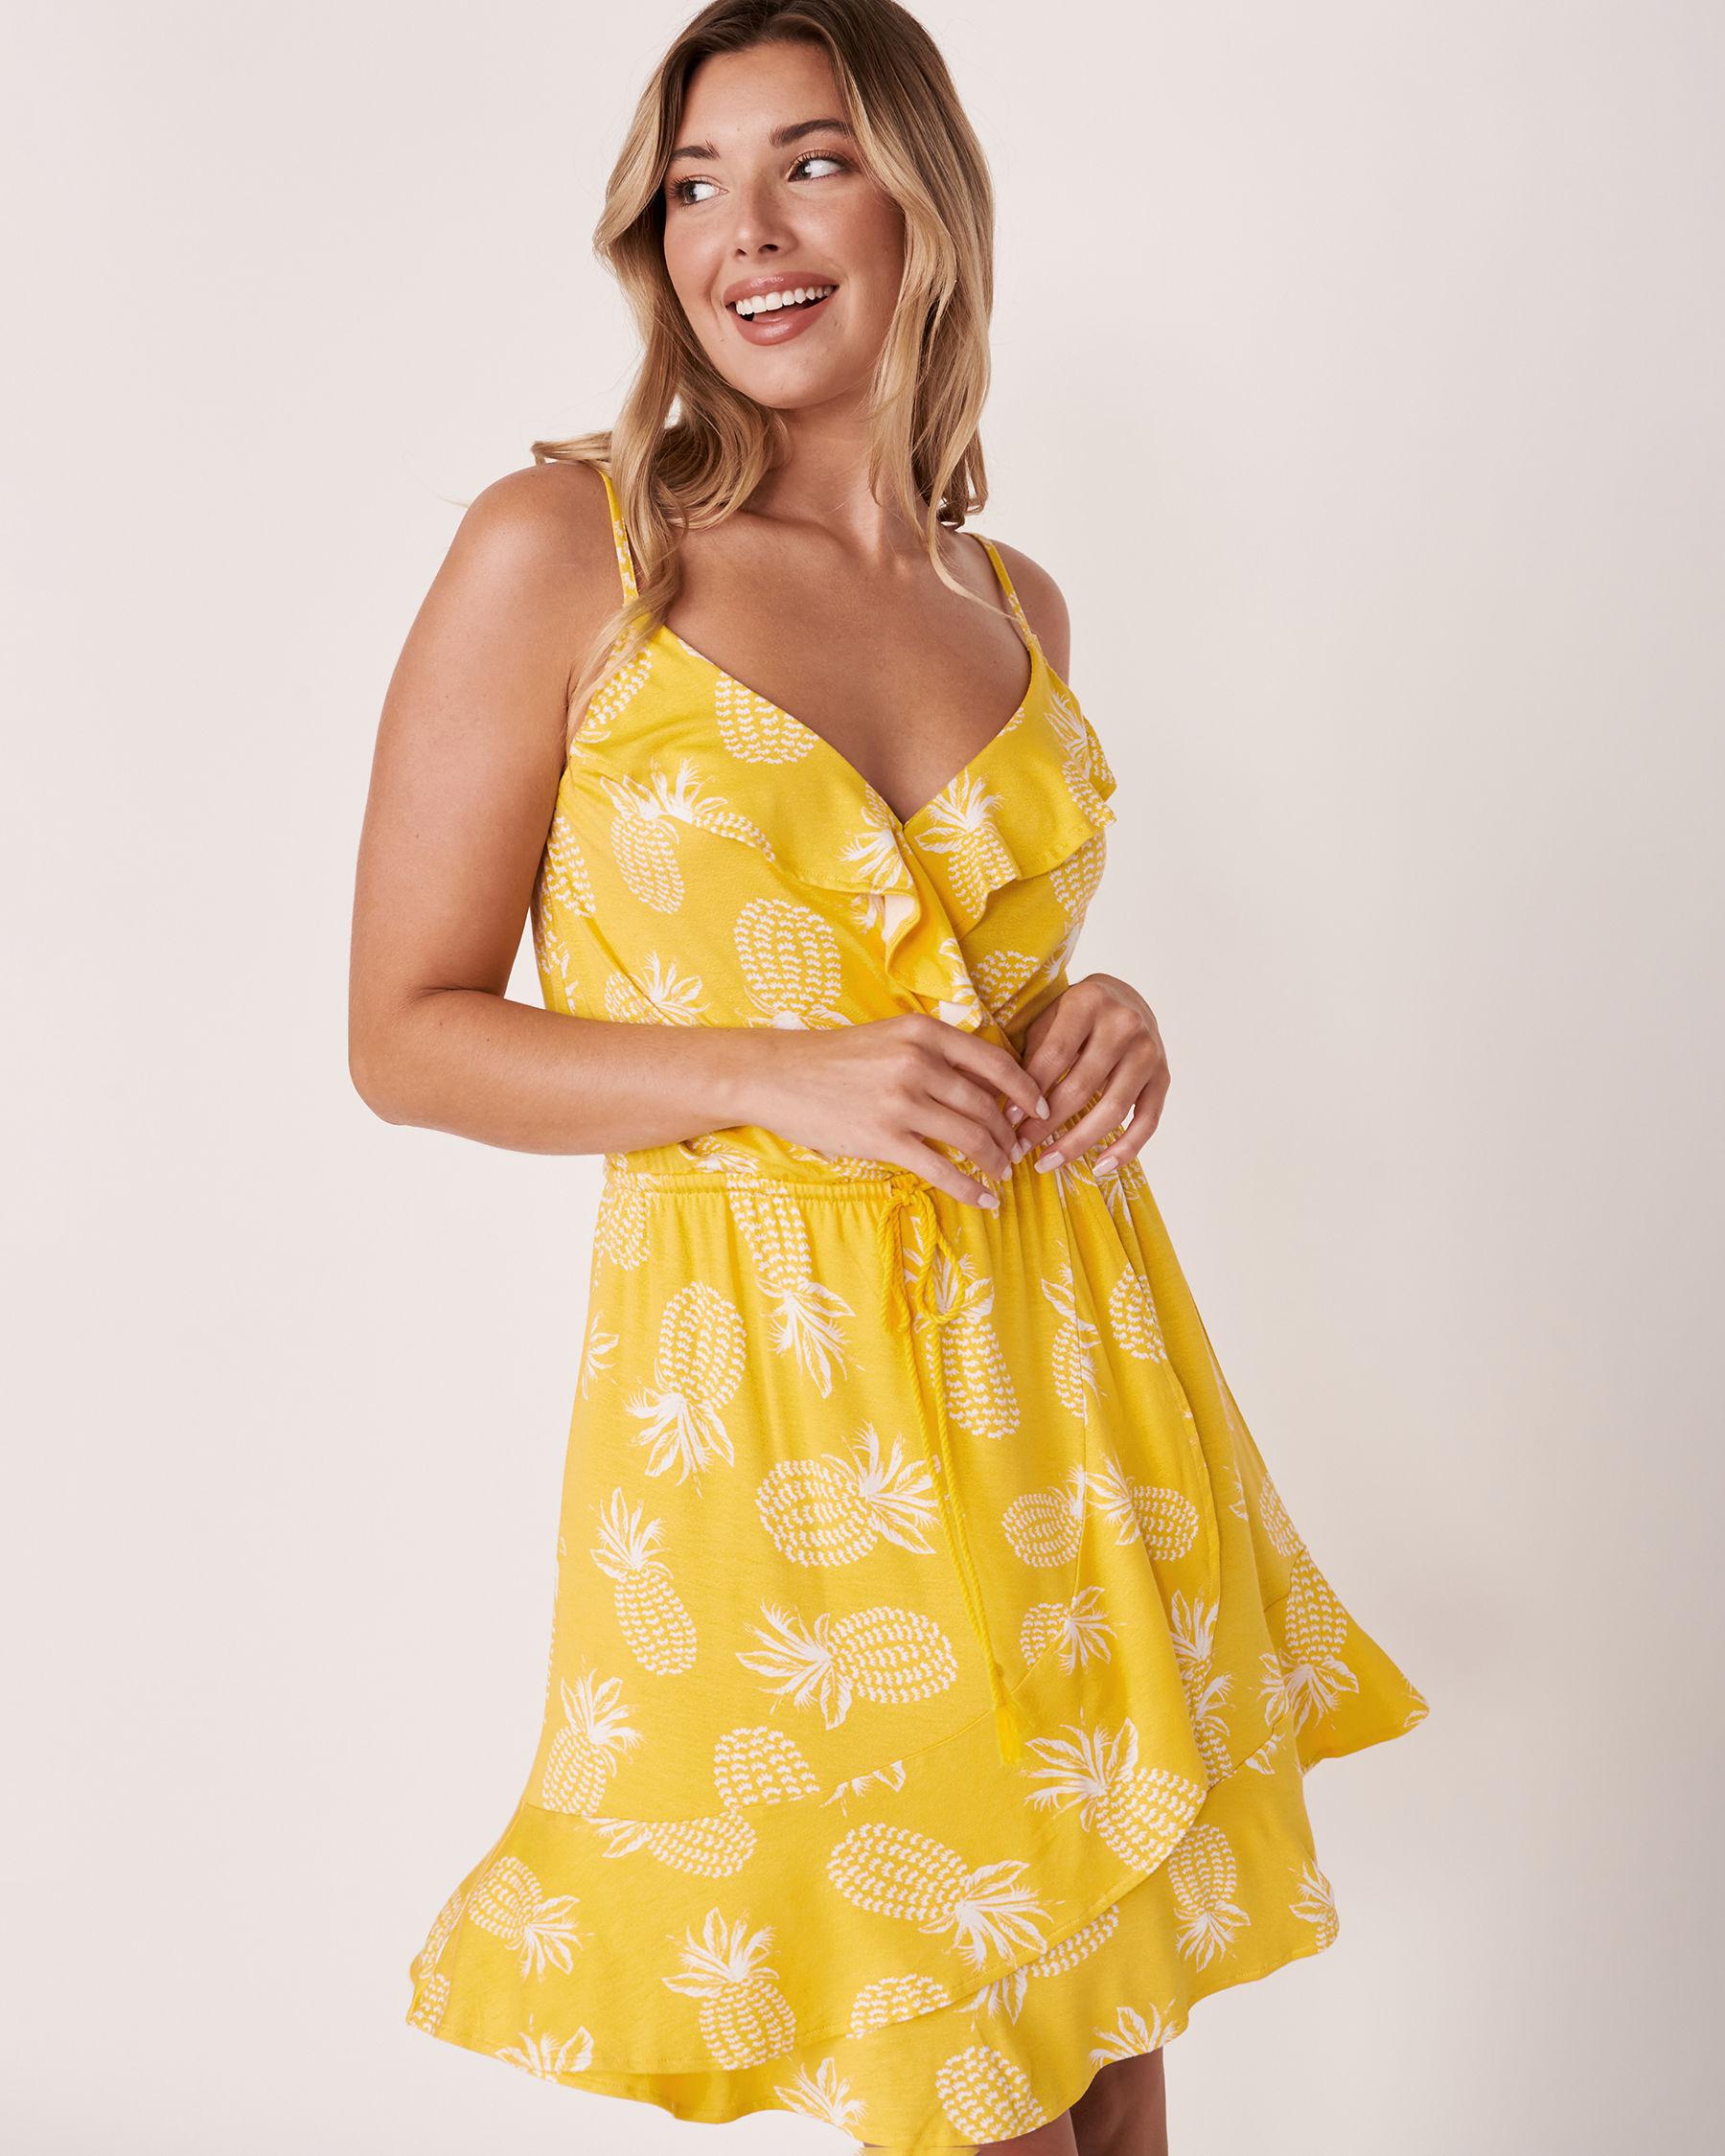 LA VIE EN ROSE AQUA Short Ruffle Dress Pineapple print 80300016 - View1